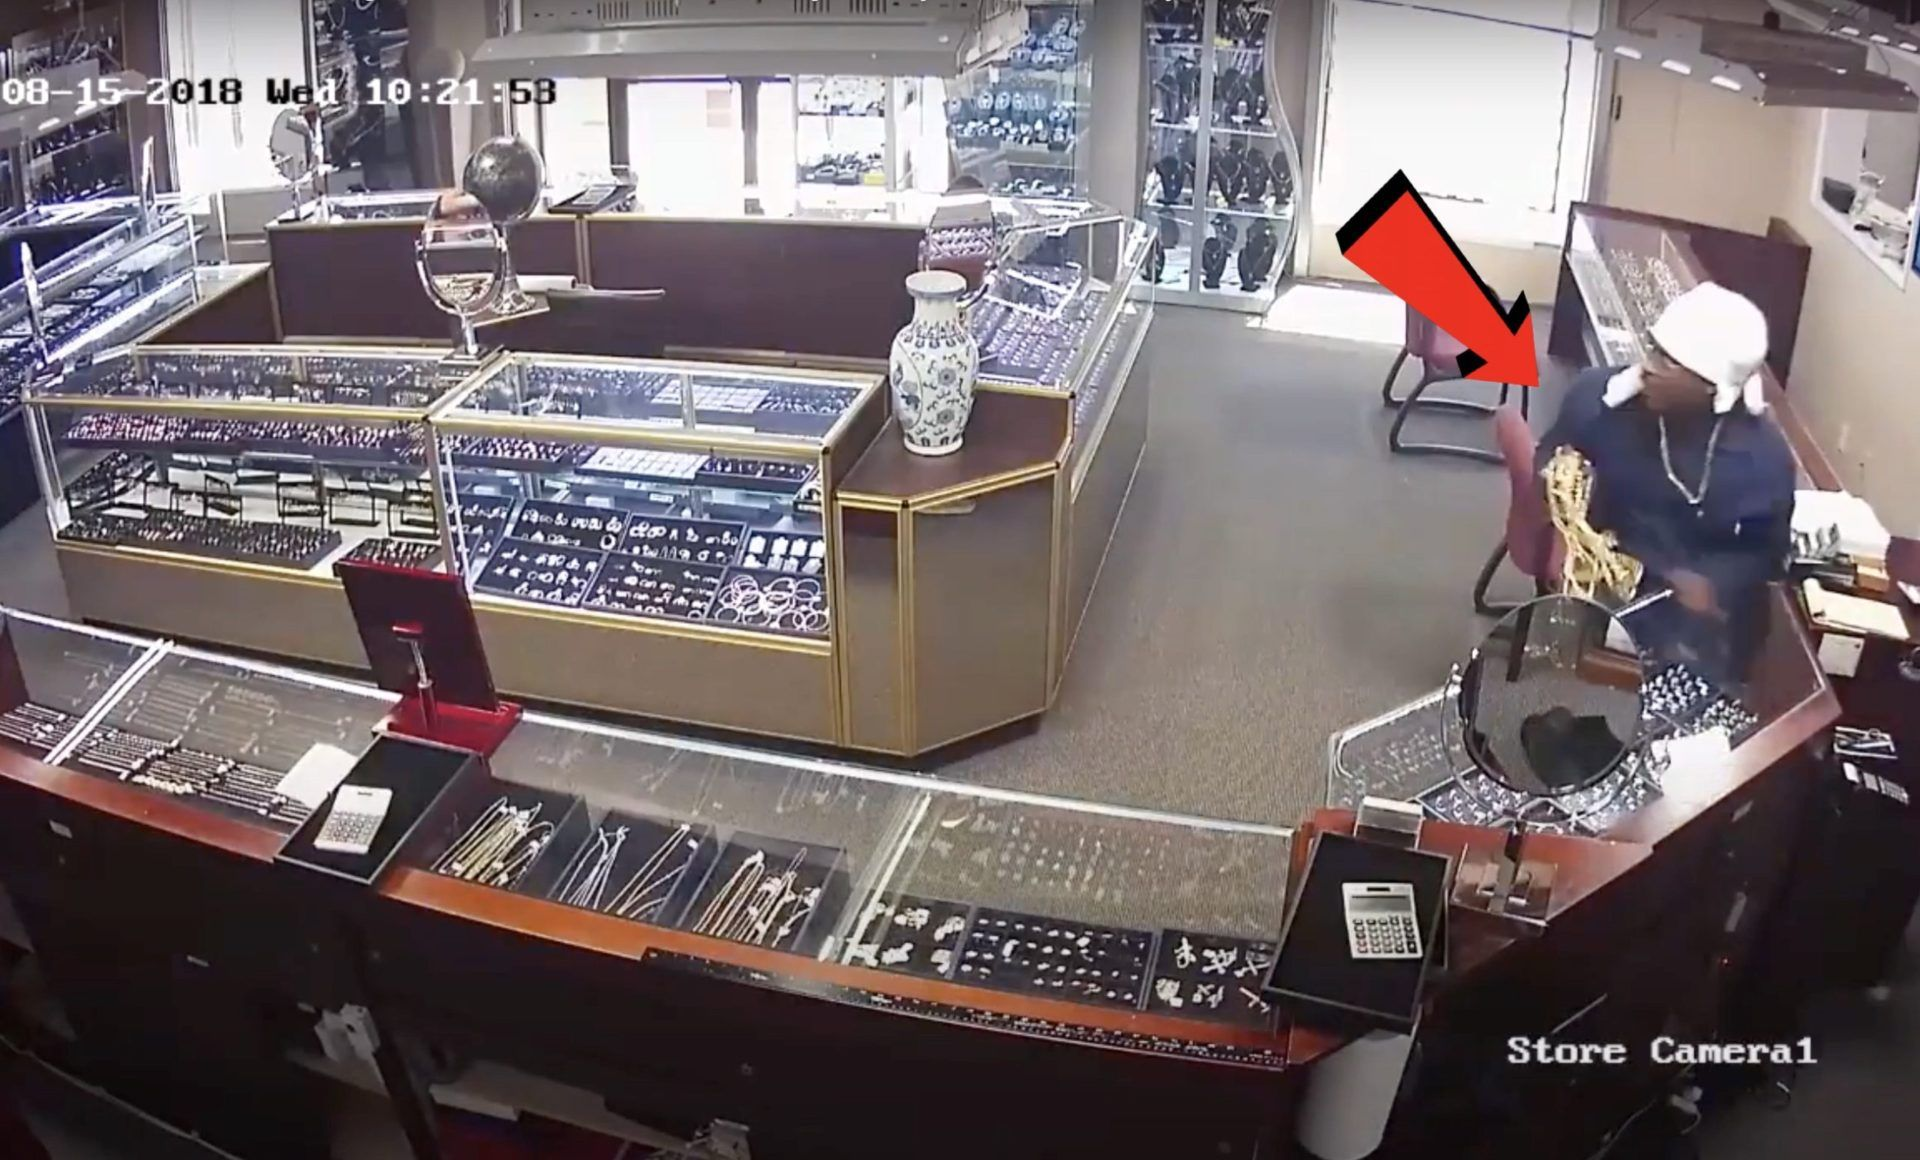 Shop Burglar | Store Robbery